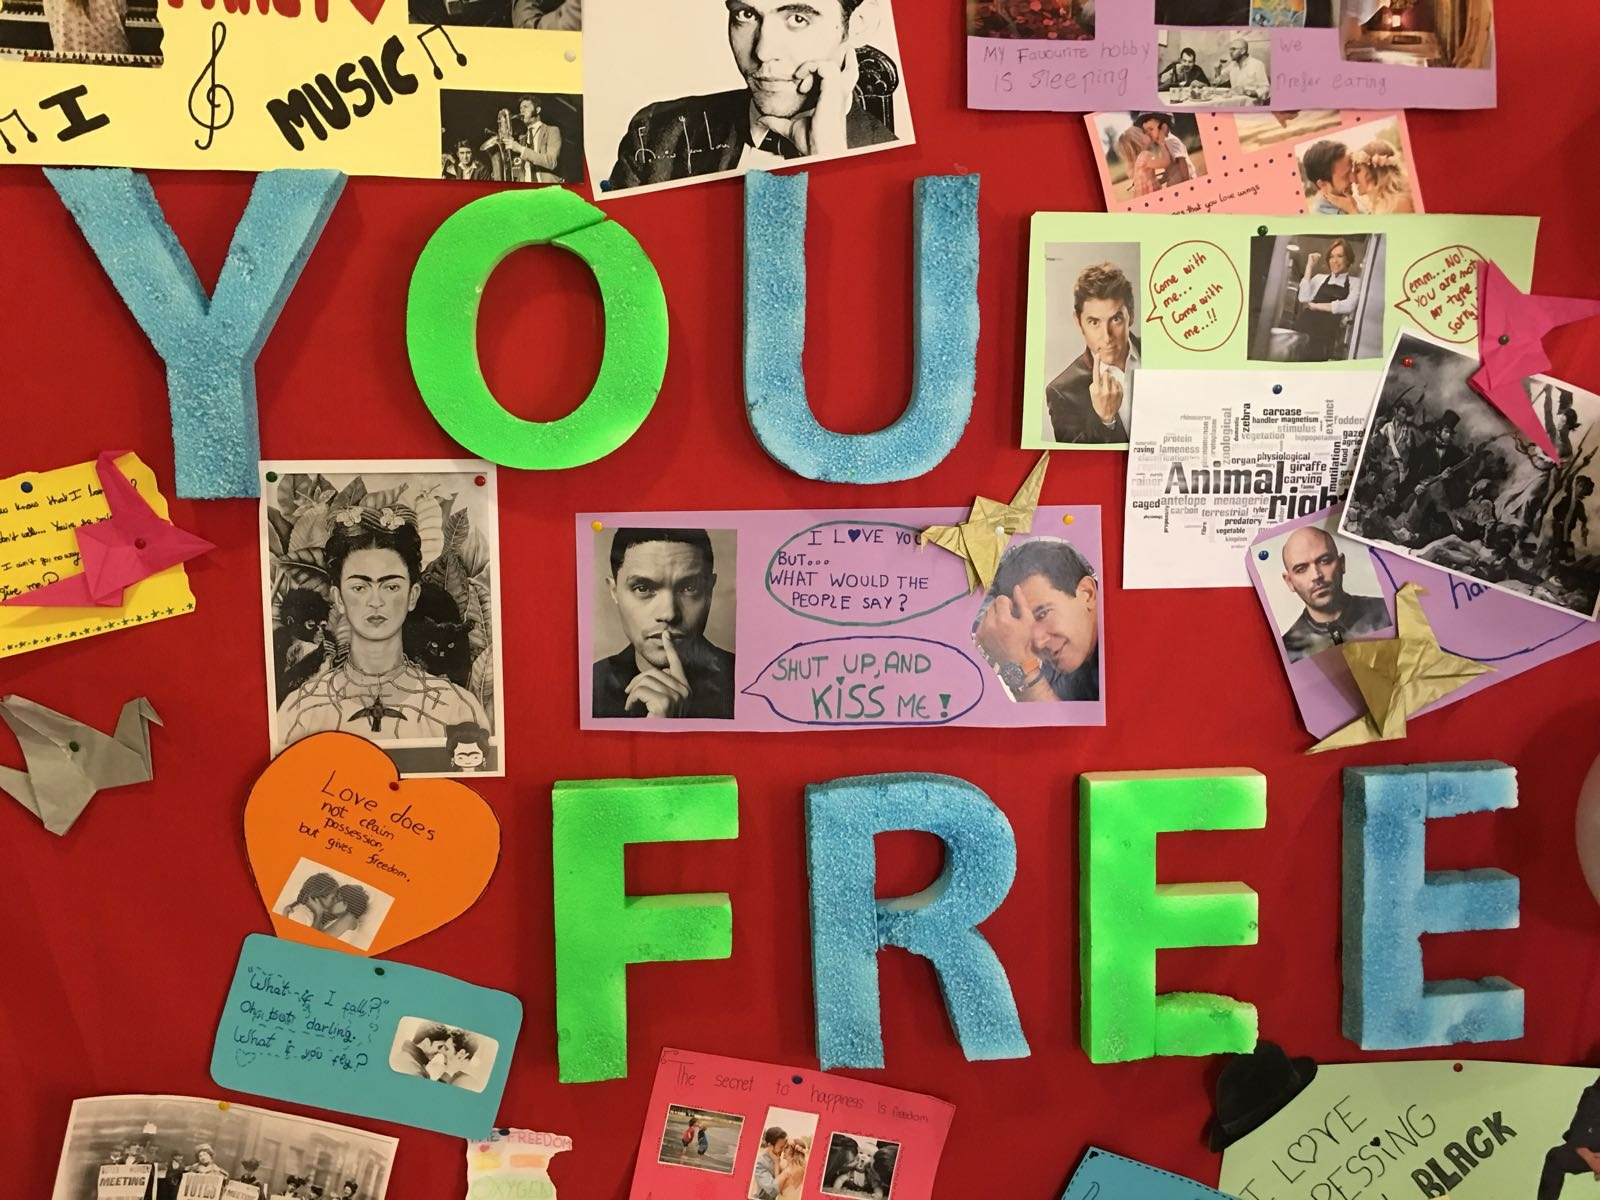 Photocall workshop - I love you free 7